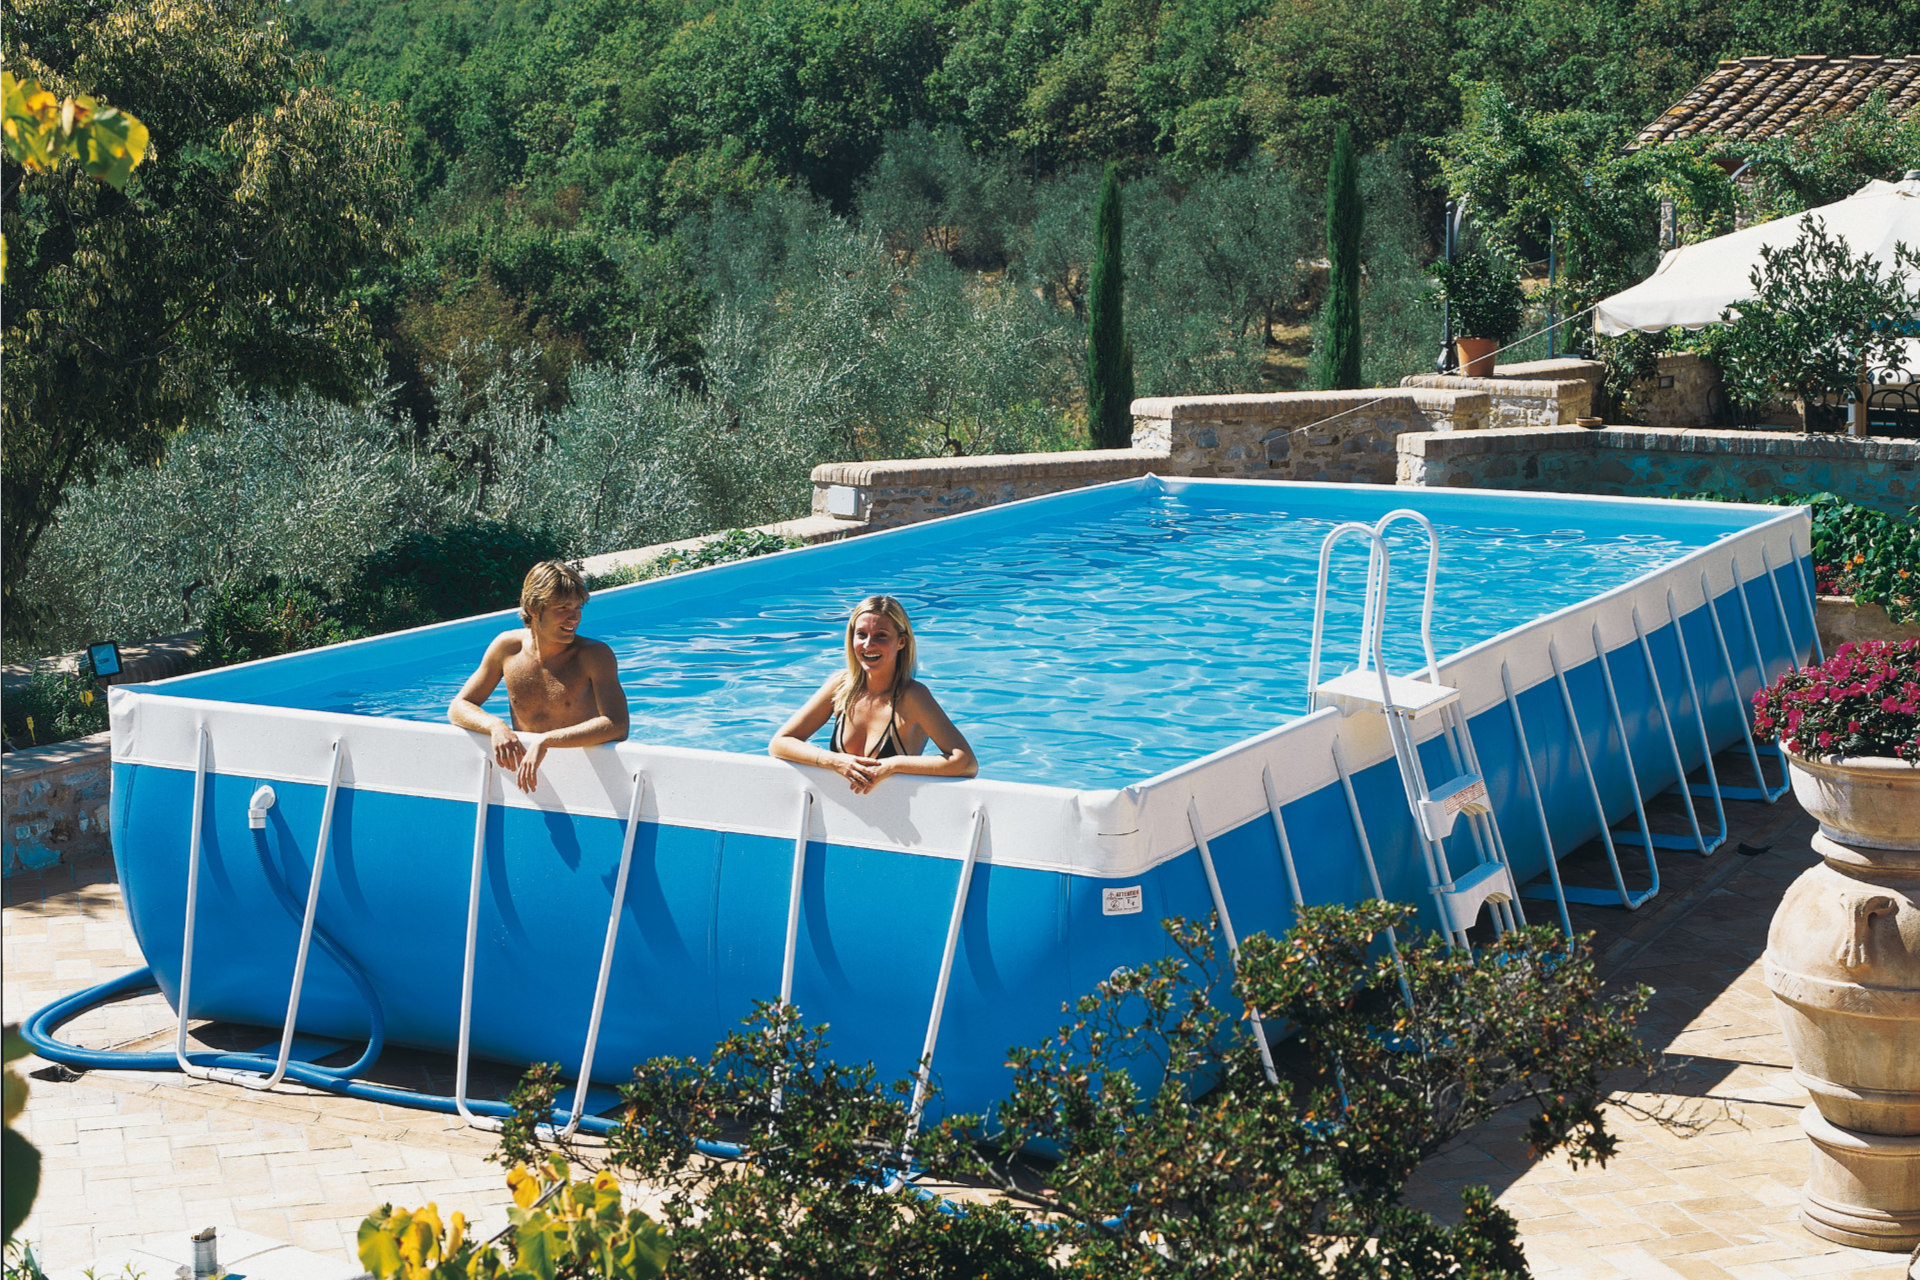 Le guide complet des piscines hors sol aquapolis - Piscine chauffee hors sol ...